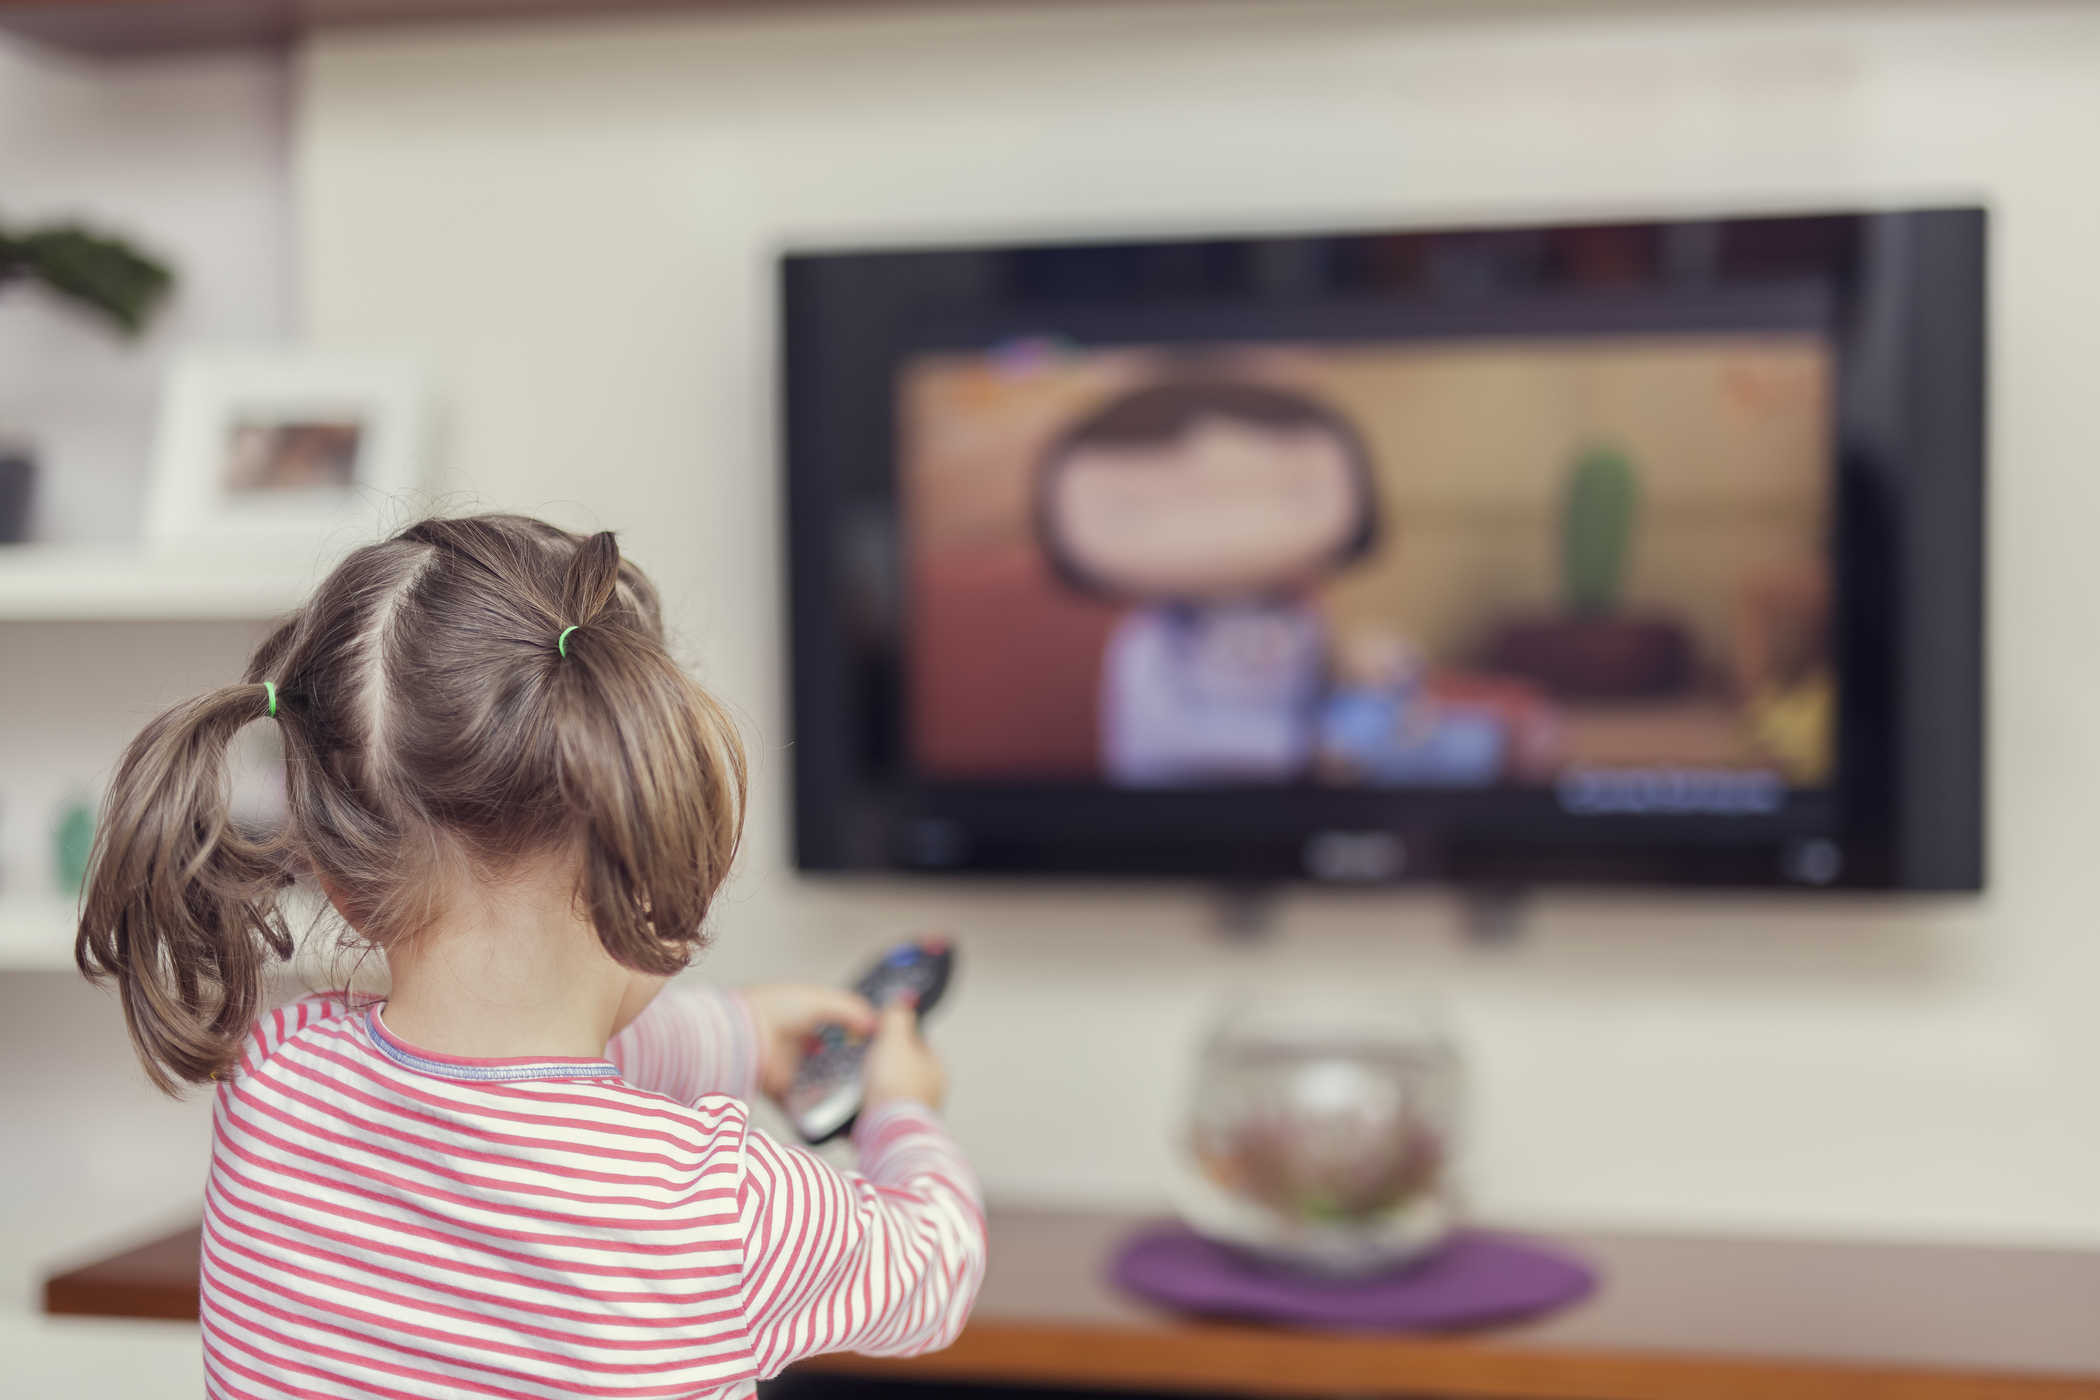 bé gái ngồi coi tivi